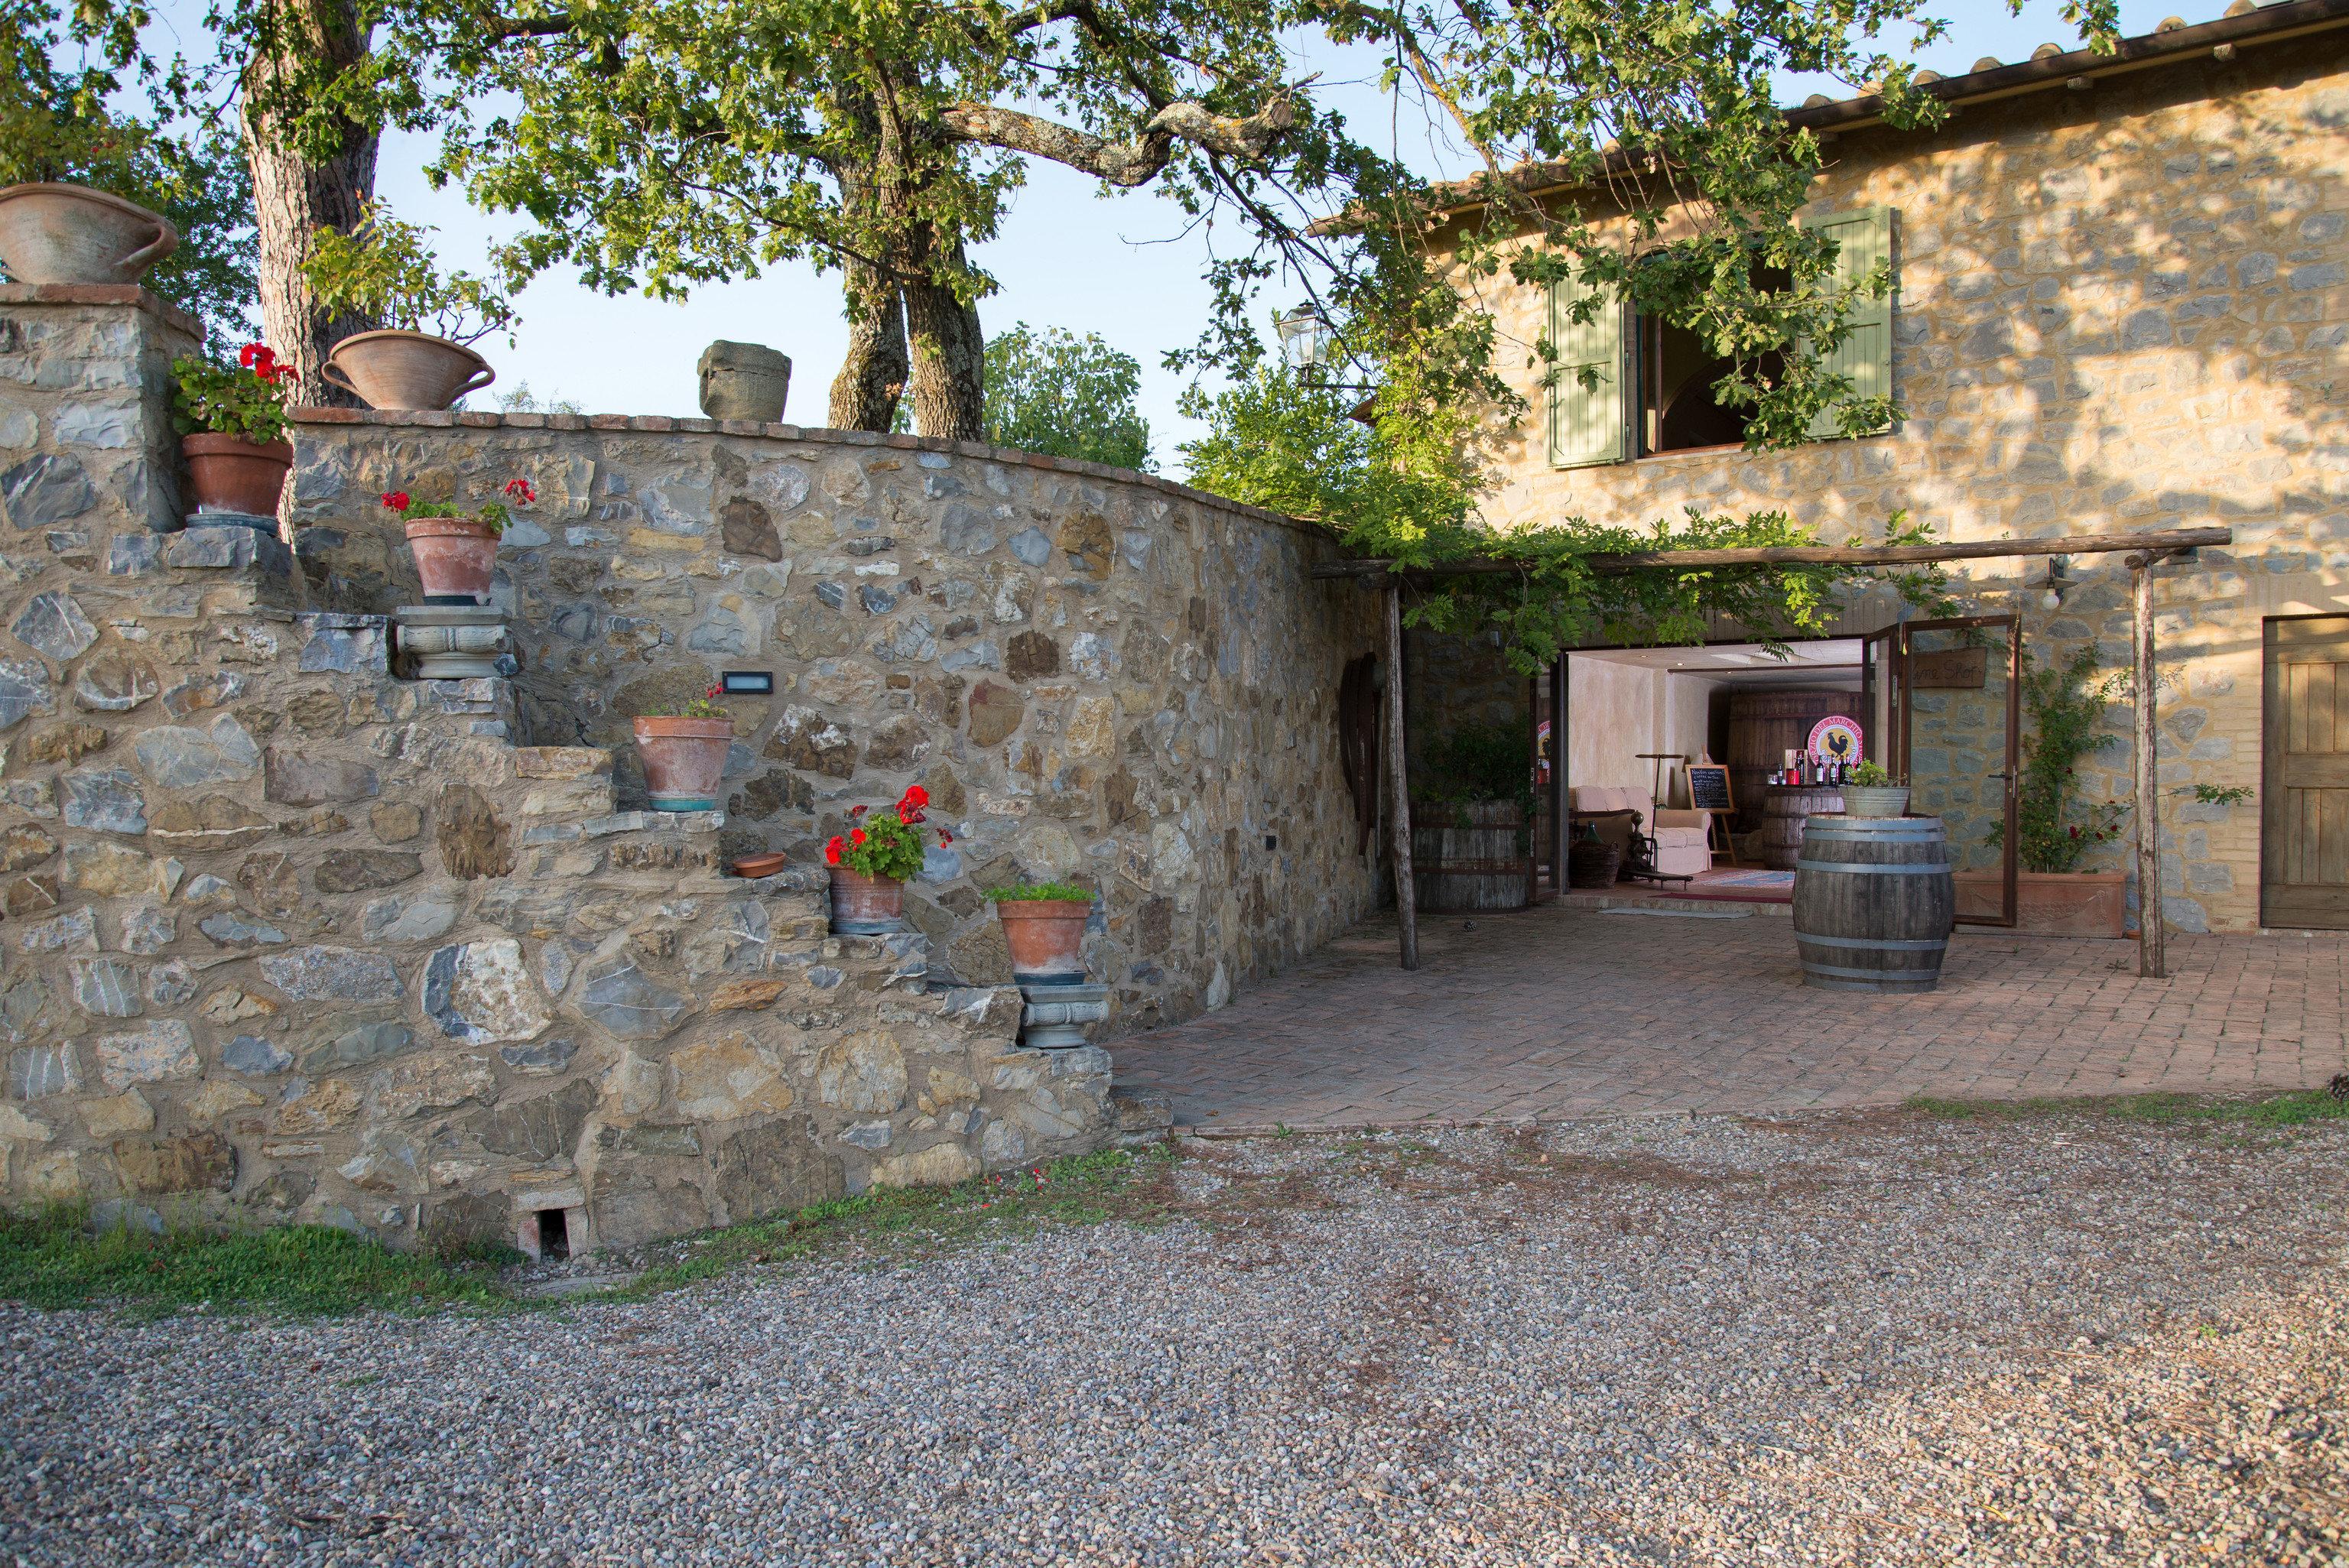 property stone building Town Village home cottage brick hacienda yard Courtyard Ruins house